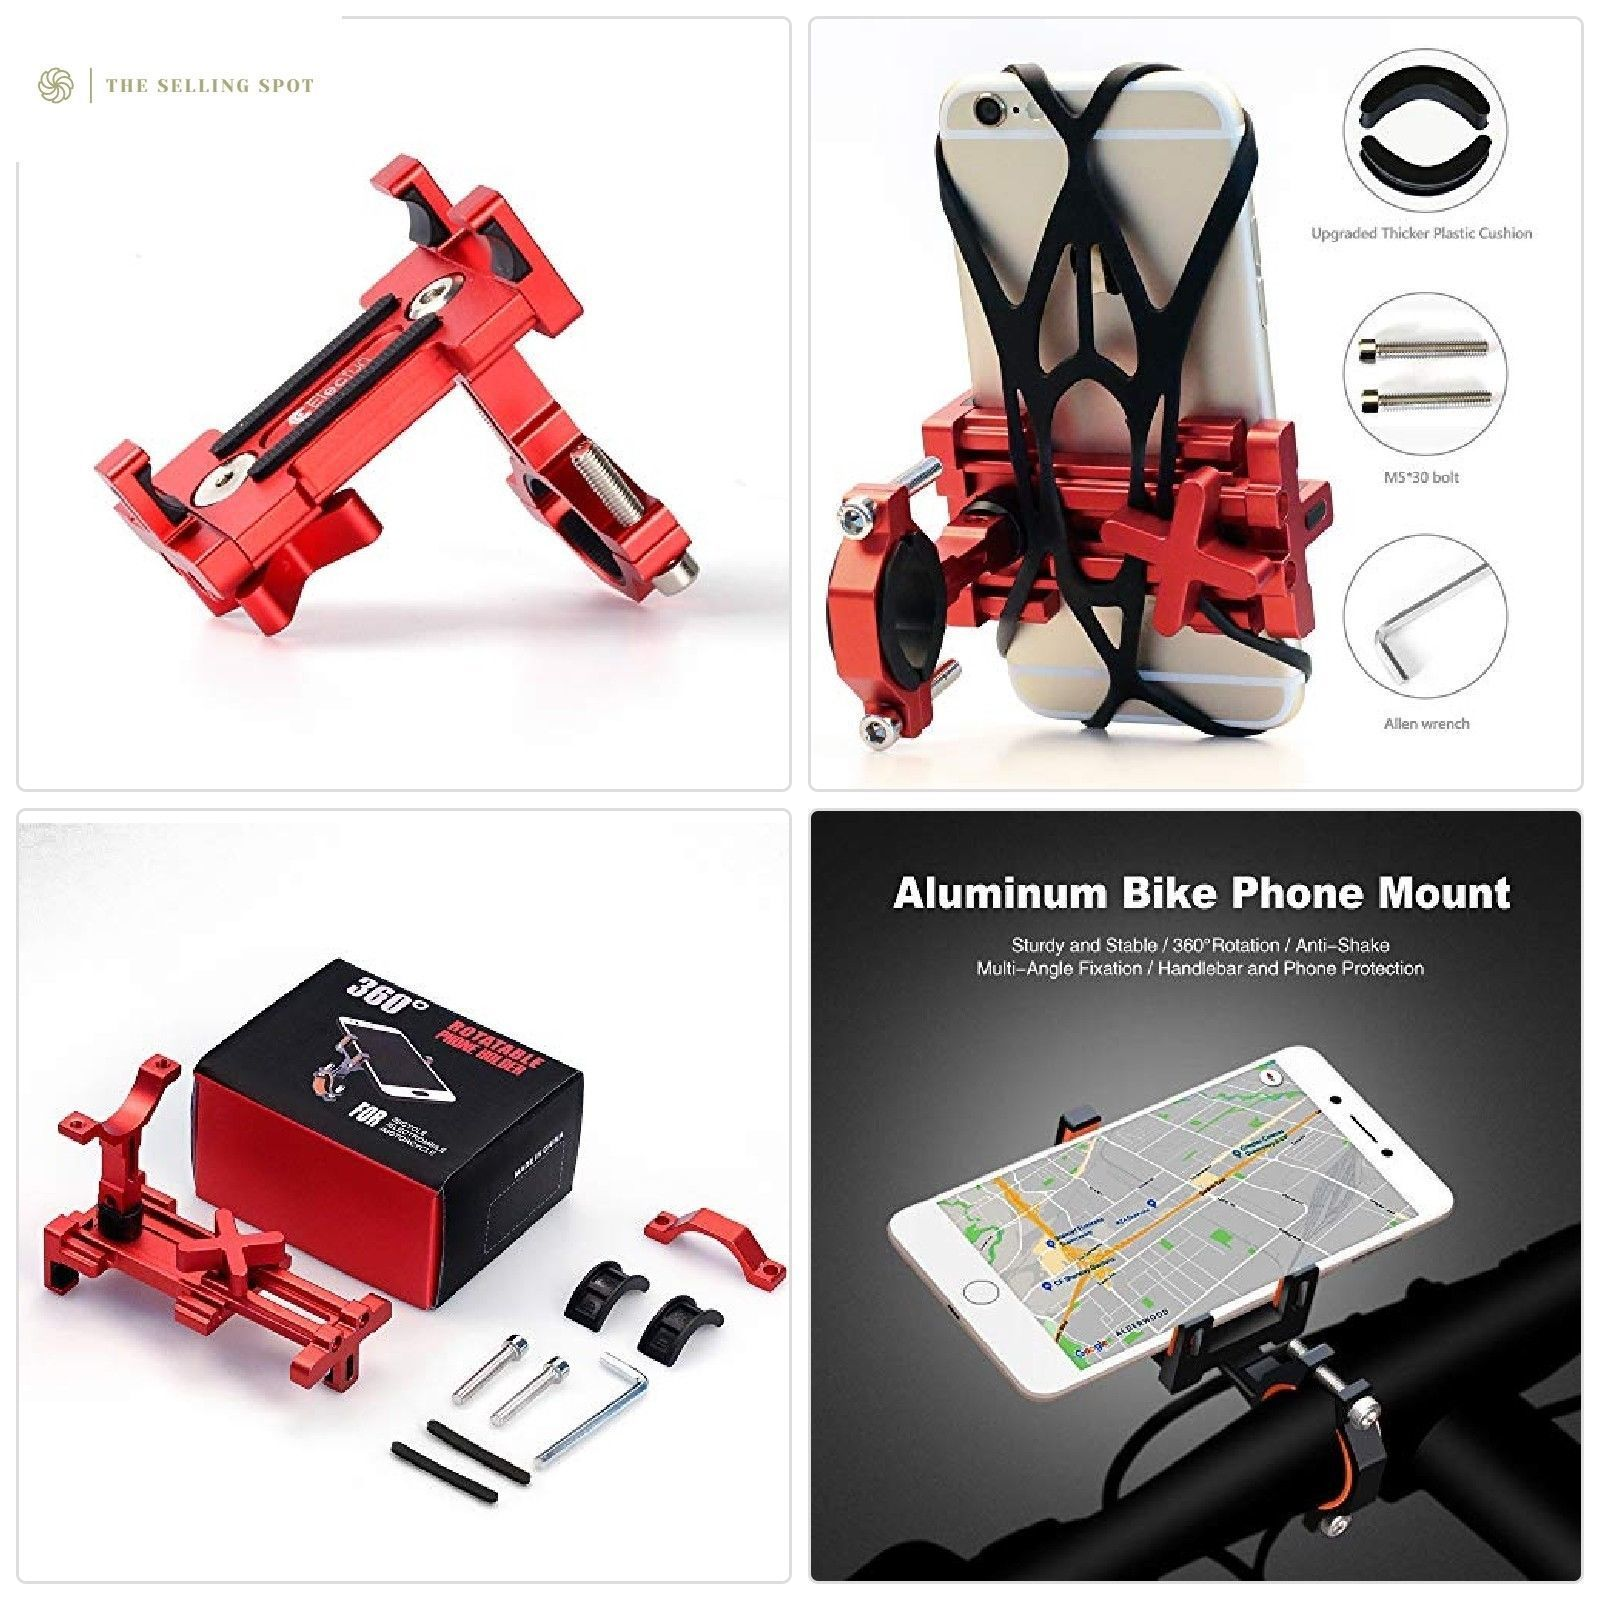 ELECFUN Bike Phone Mount, Universal Cell Phone Bicycle